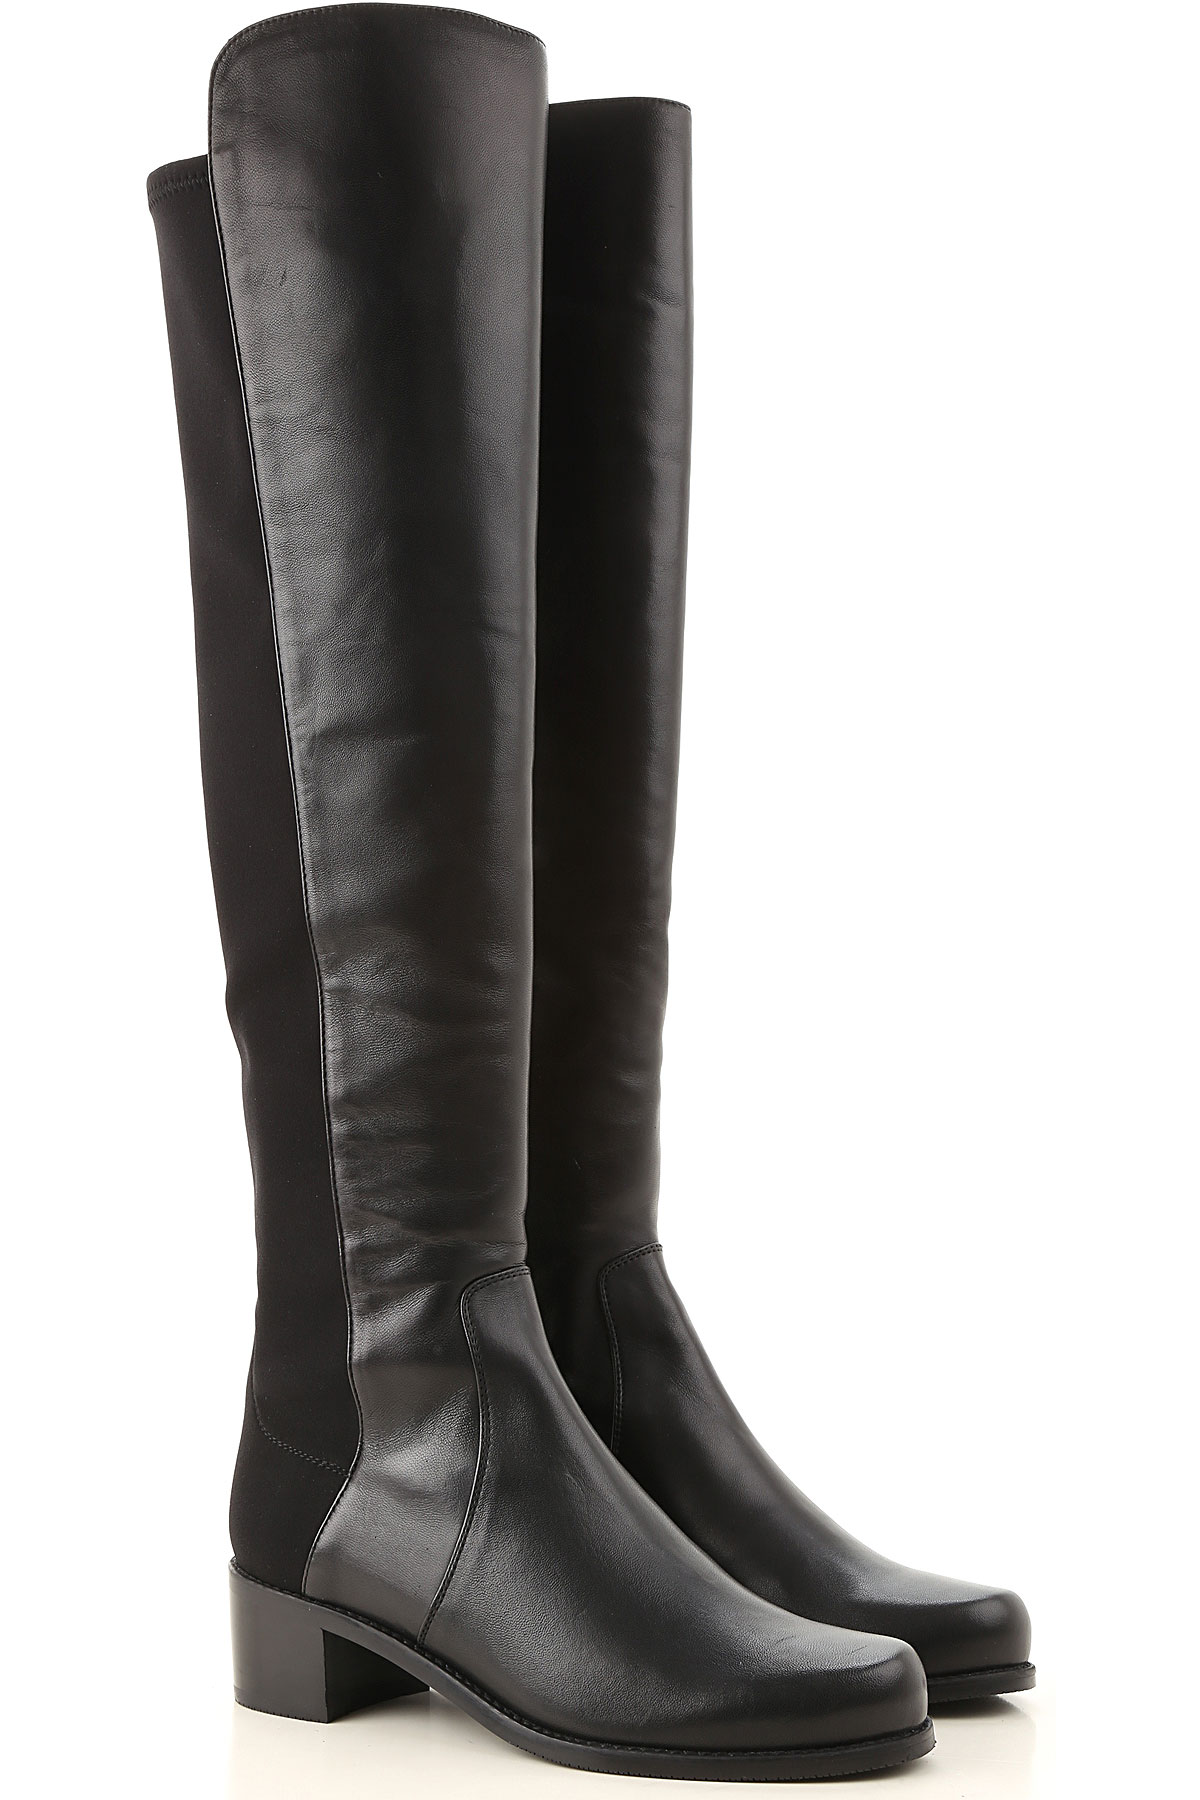 Stuart Weitzman Boots for Women, Booties, Black, Leather, 2019, US 7.5 (EU 38) US 8.5 (EU 39)